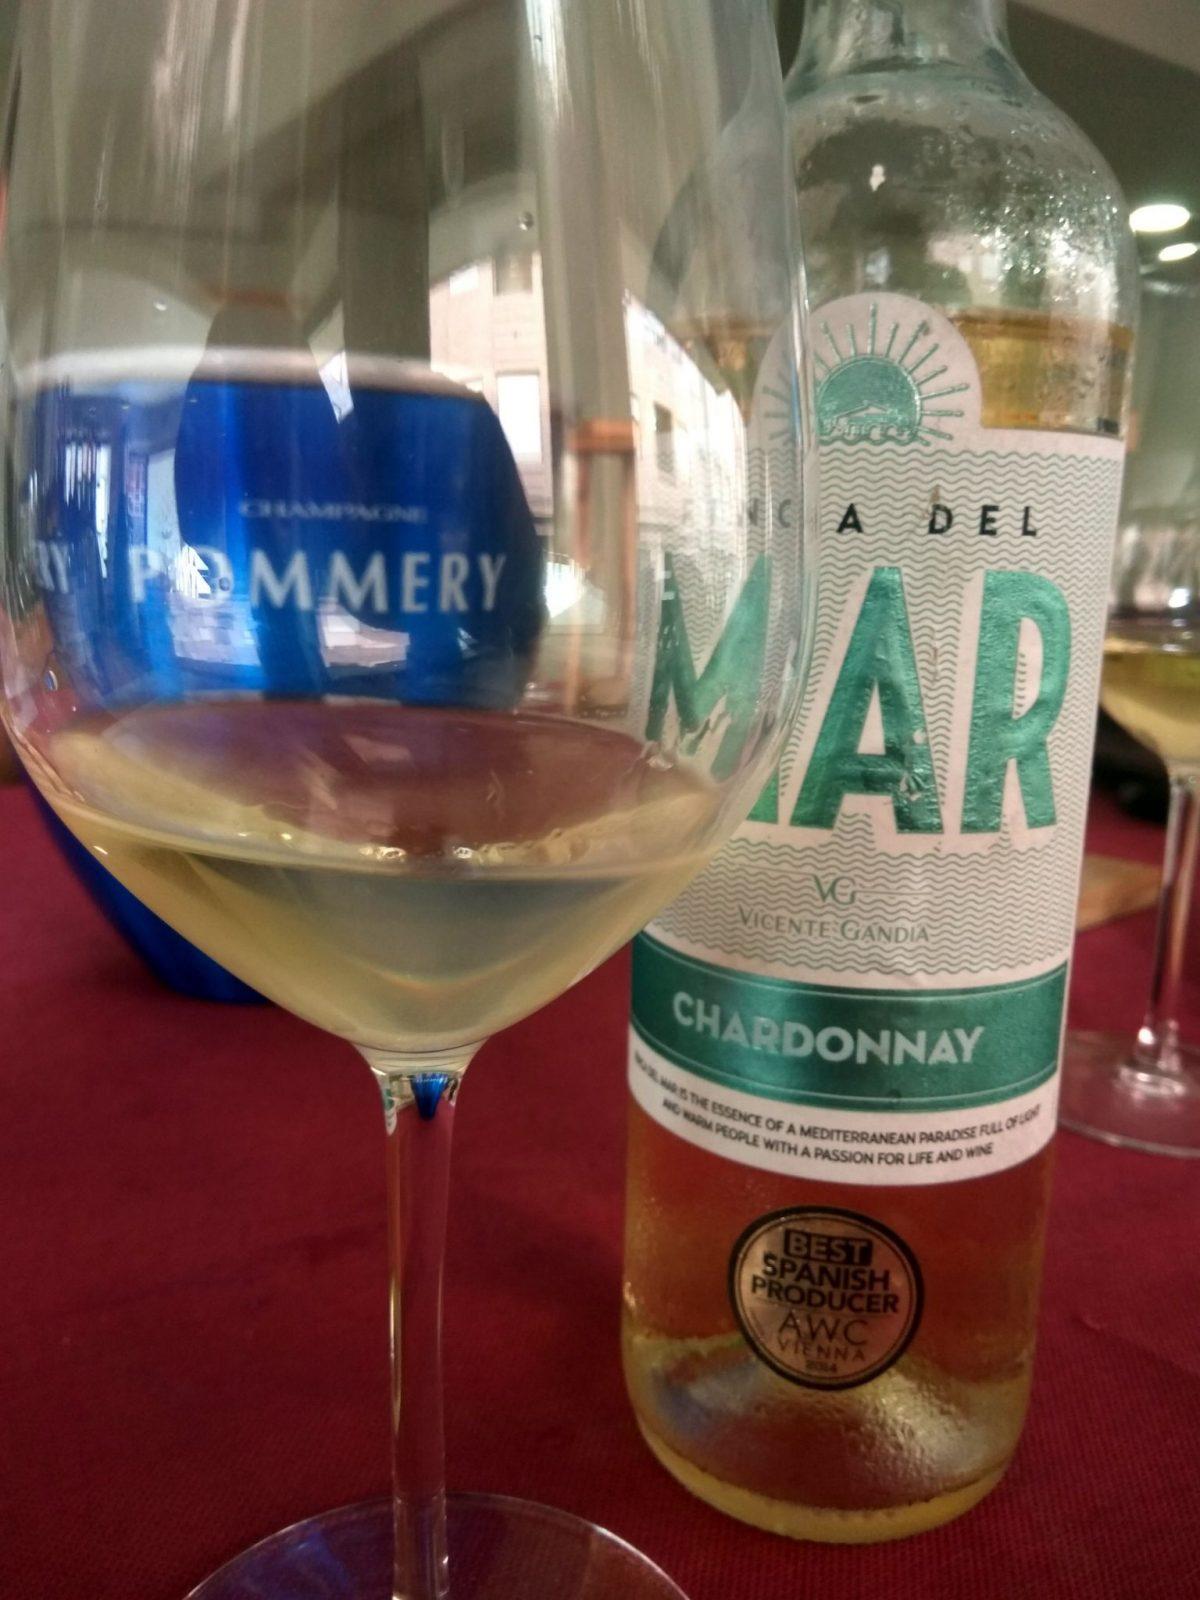 Finca del Mar Chardonnay 2018